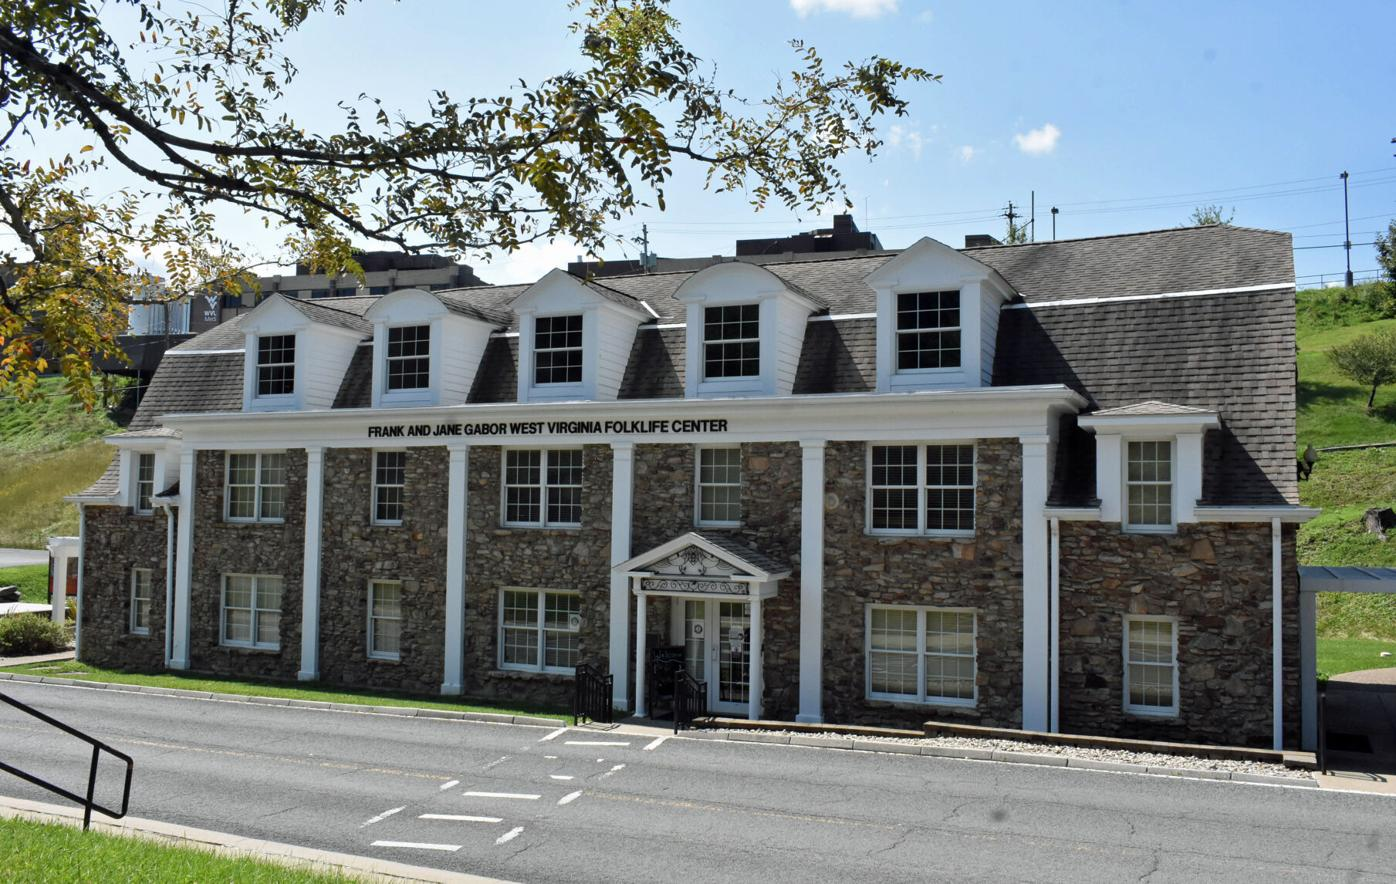 The Frank and Jane Gabor West Virginia Folklife Center